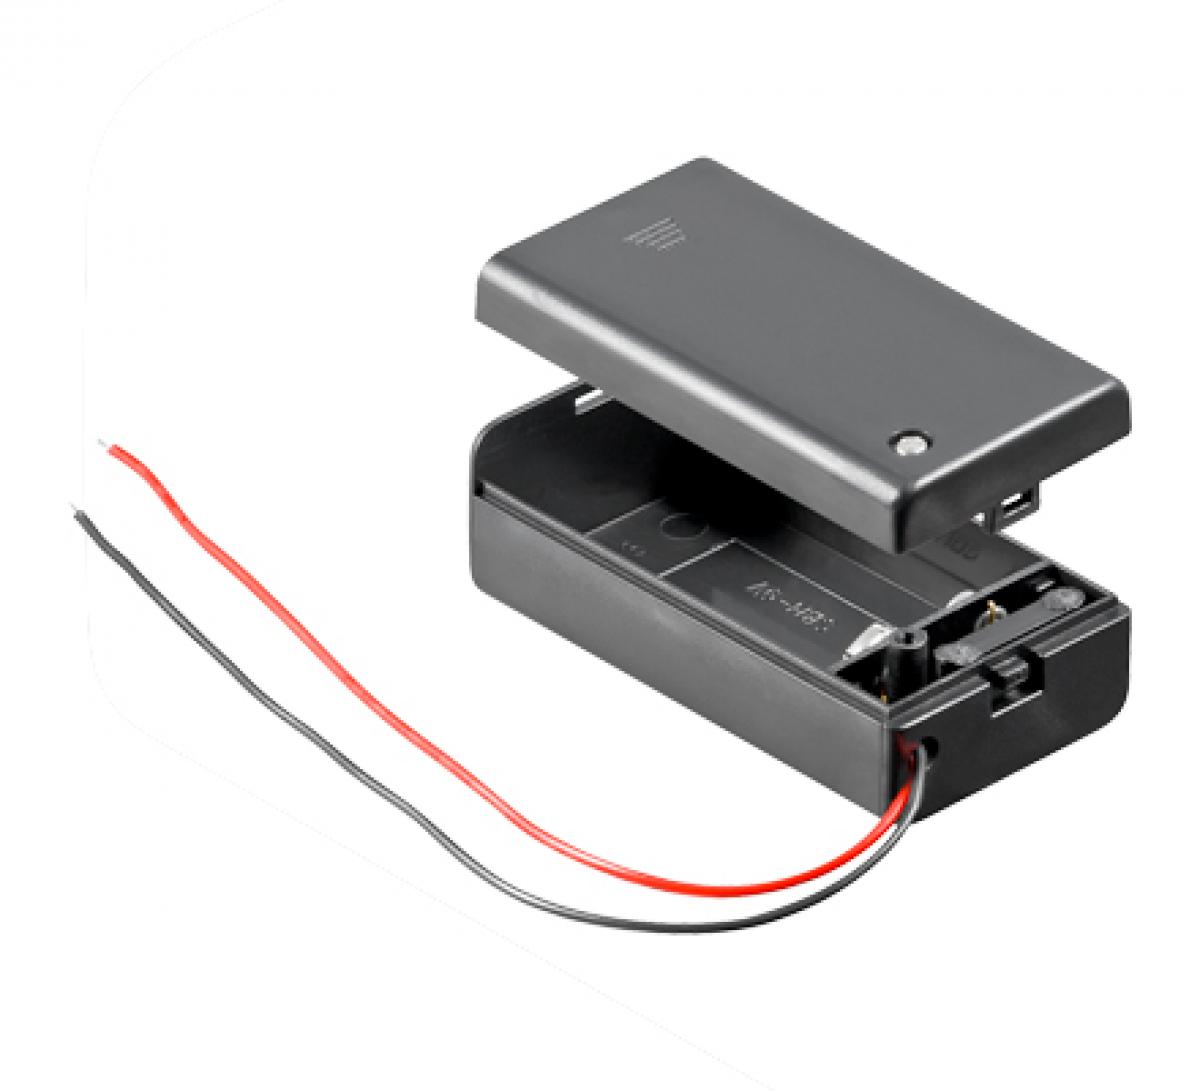 batteriehalter 1 x 9 volt block im geschlossenen geh use. Black Bedroom Furniture Sets. Home Design Ideas